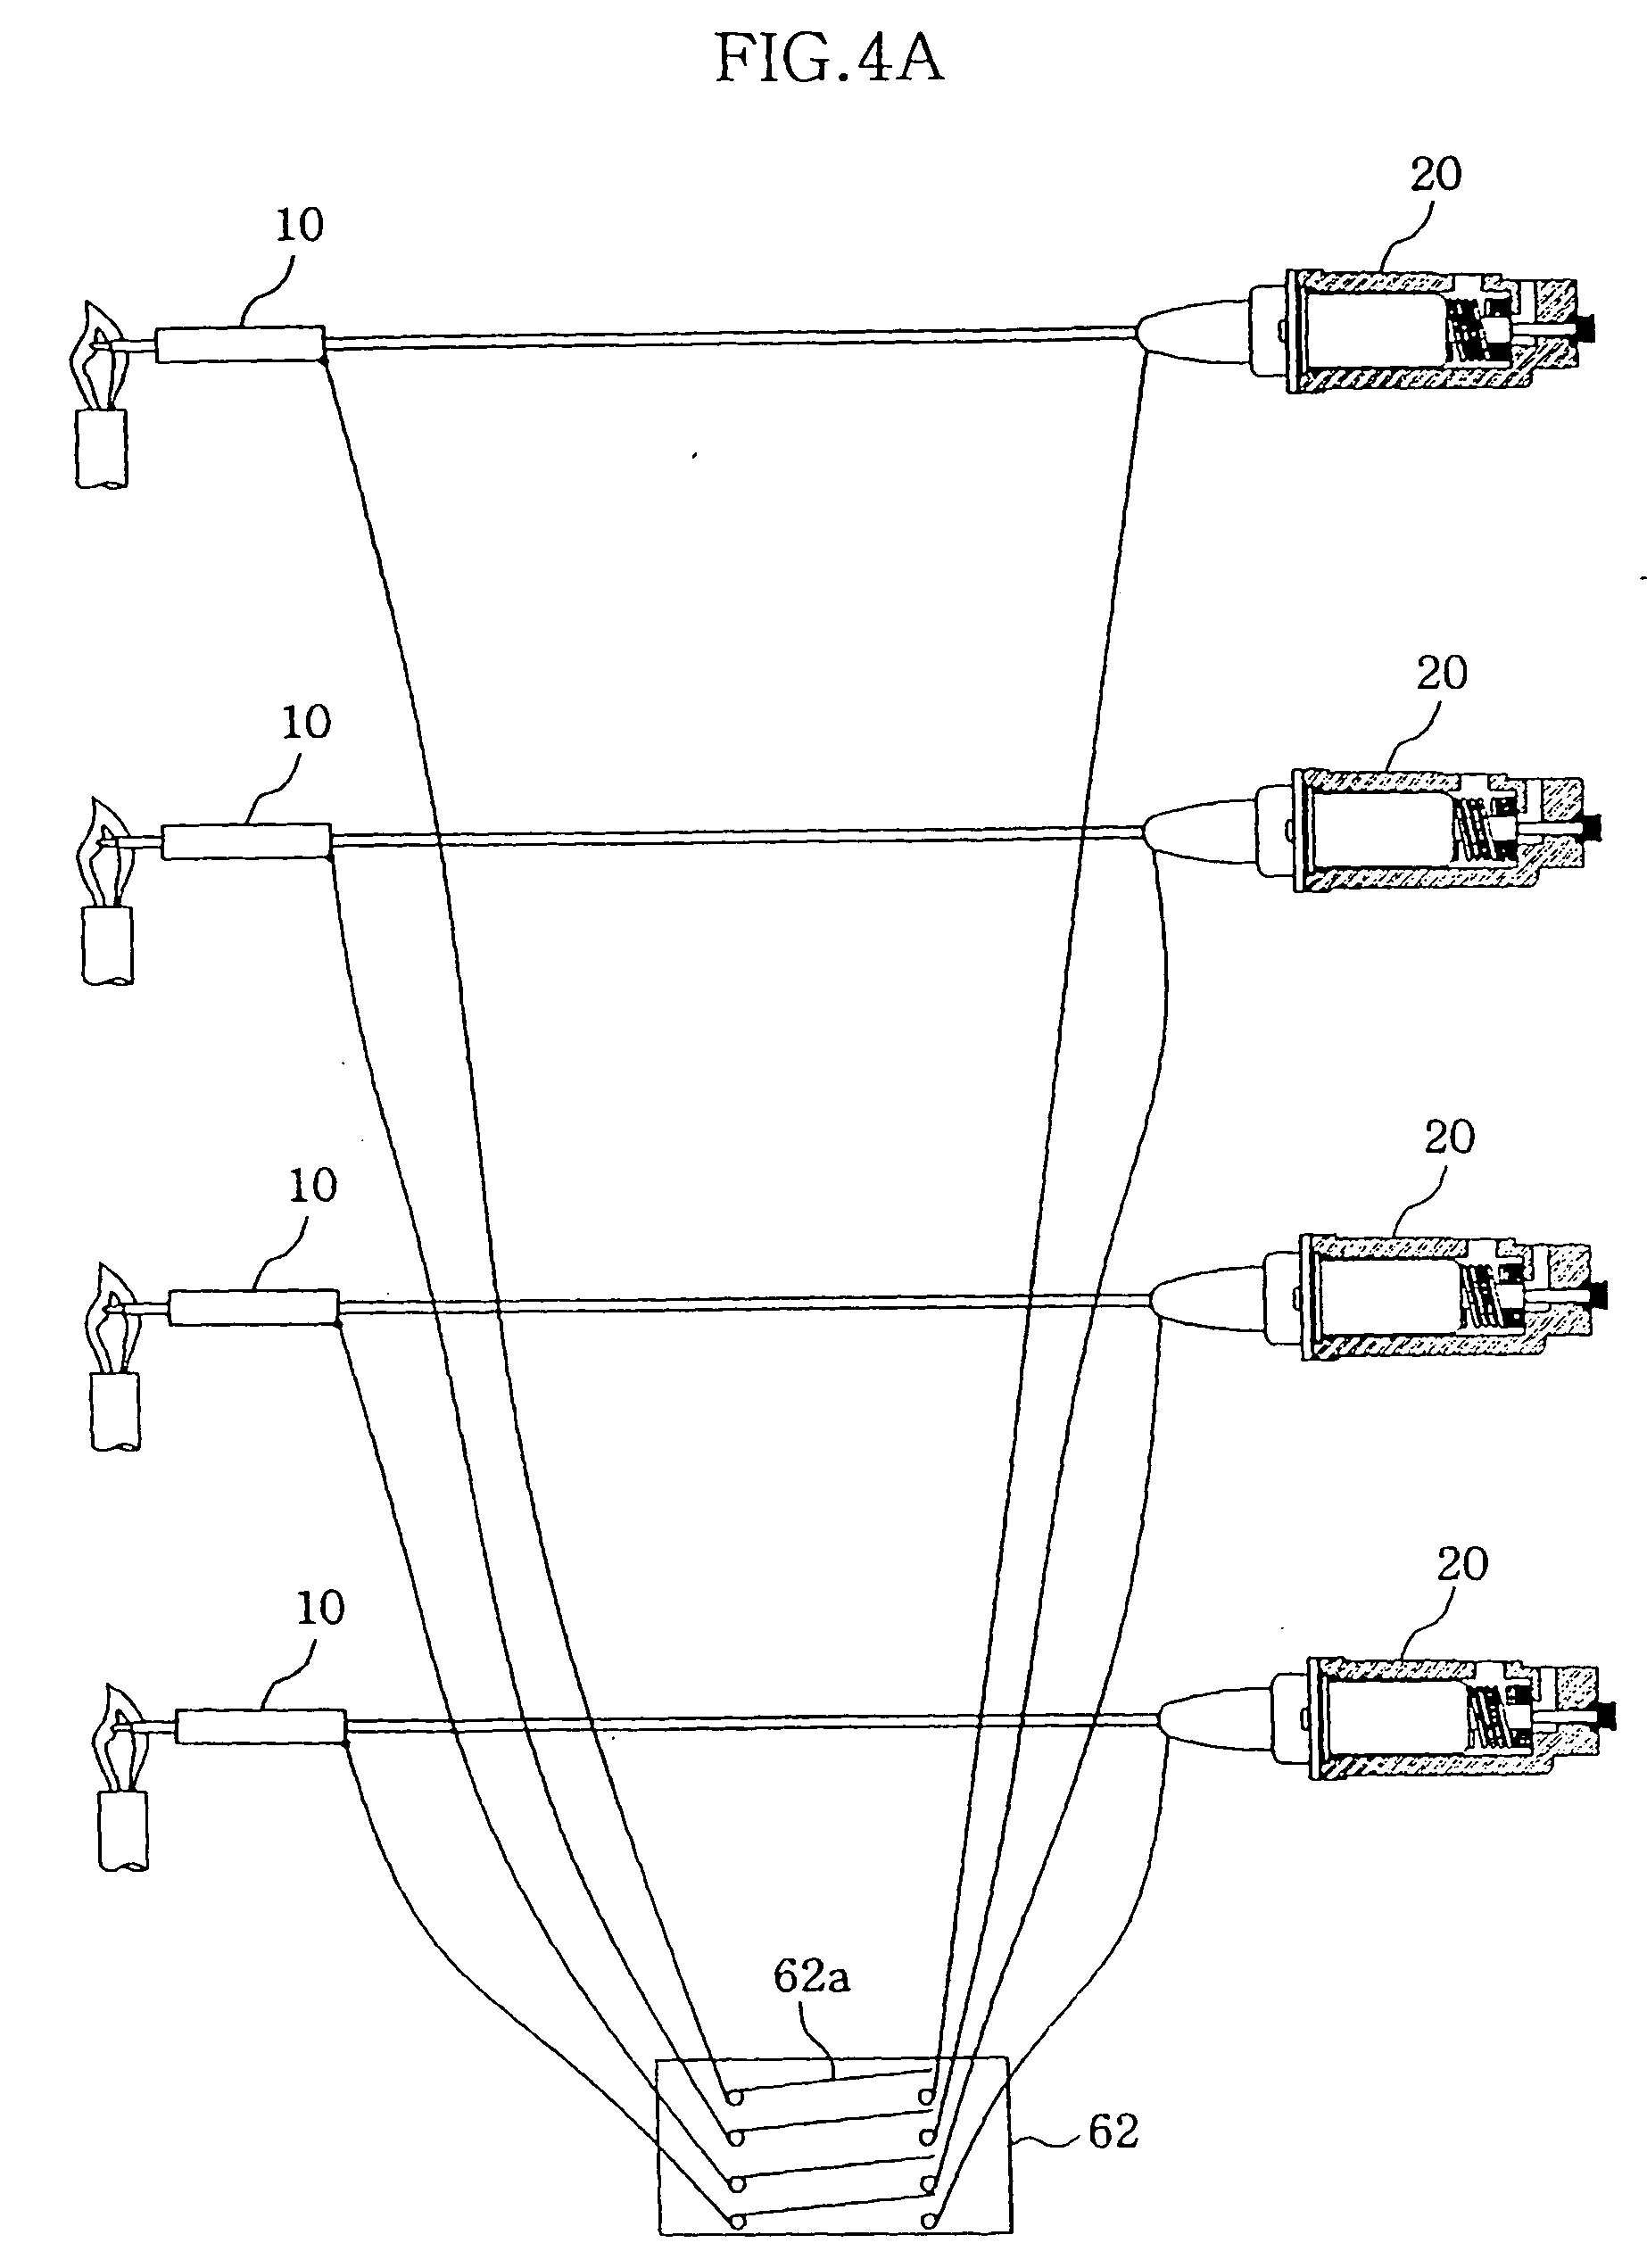 1970 fj40 wiring diagram 1970 image wiring diagram 1970 fj40 wiring diagram wiring diagrams on 1970 fj40 wiring diagram